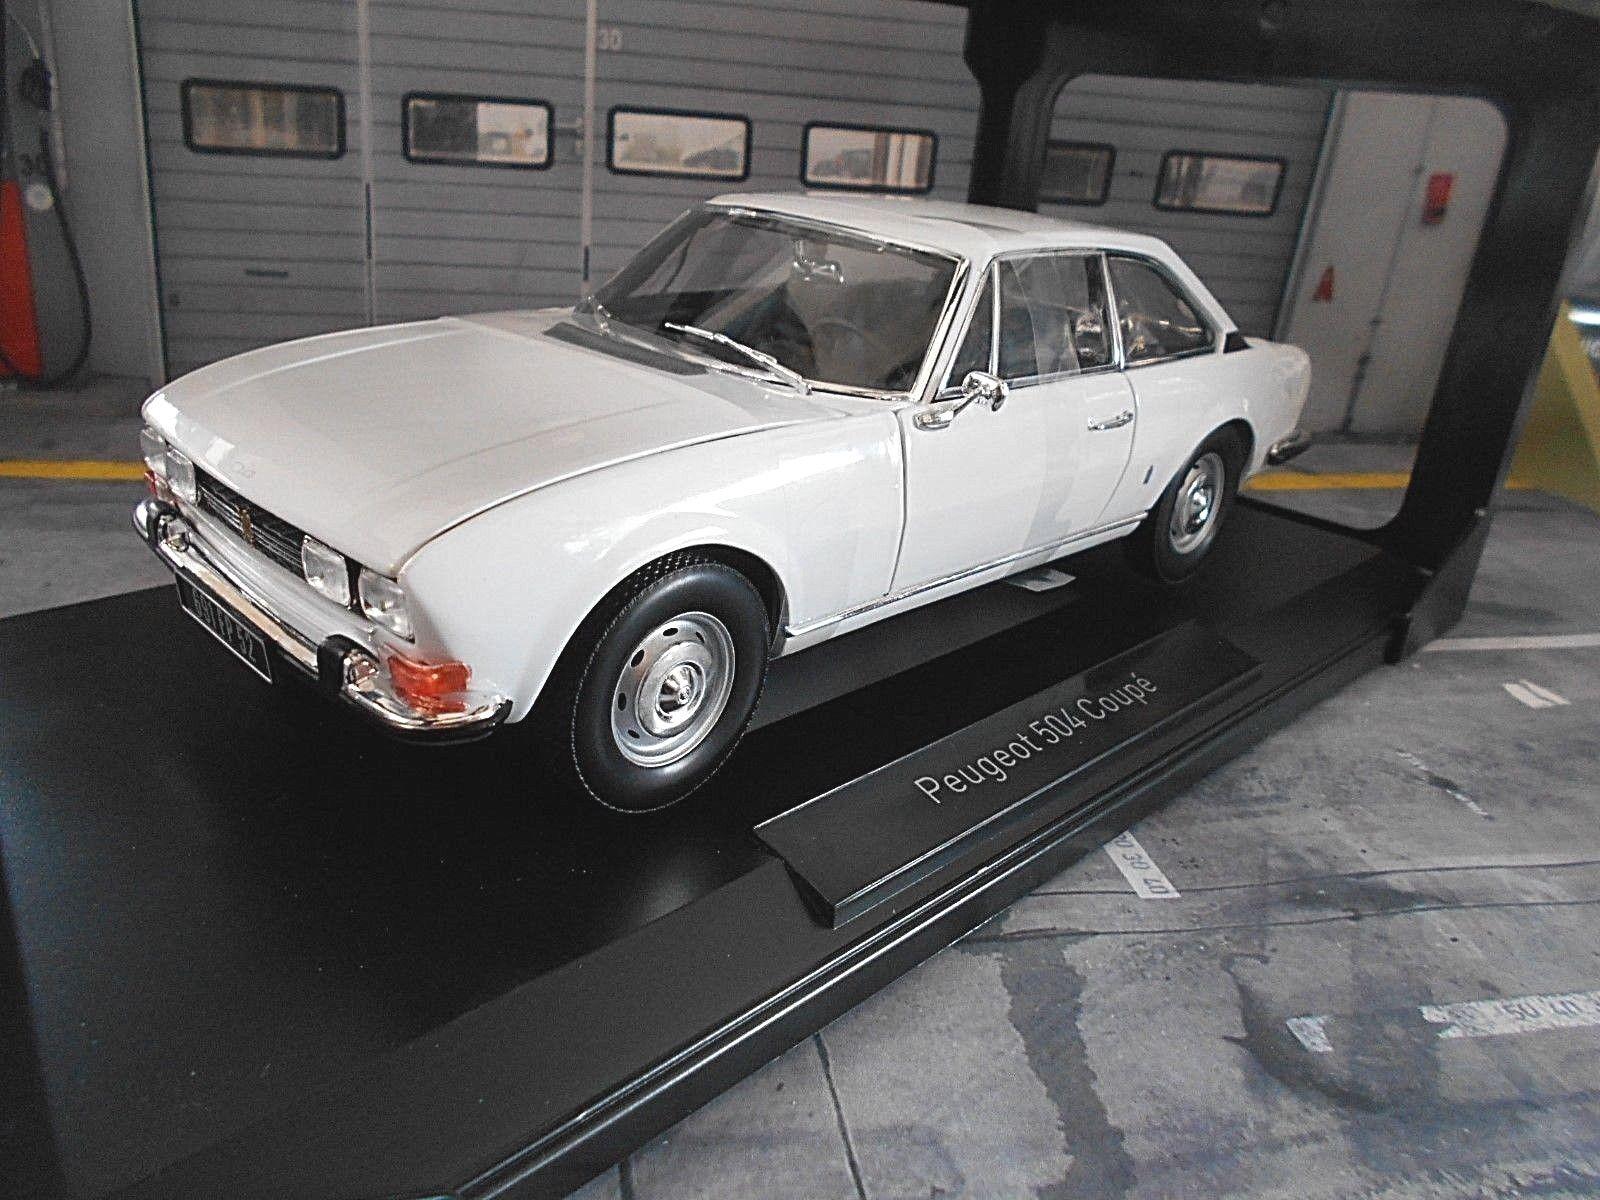 Peugeot 504 Coupe MKI 1969 blancoo blancoo 184825 norev 1 18